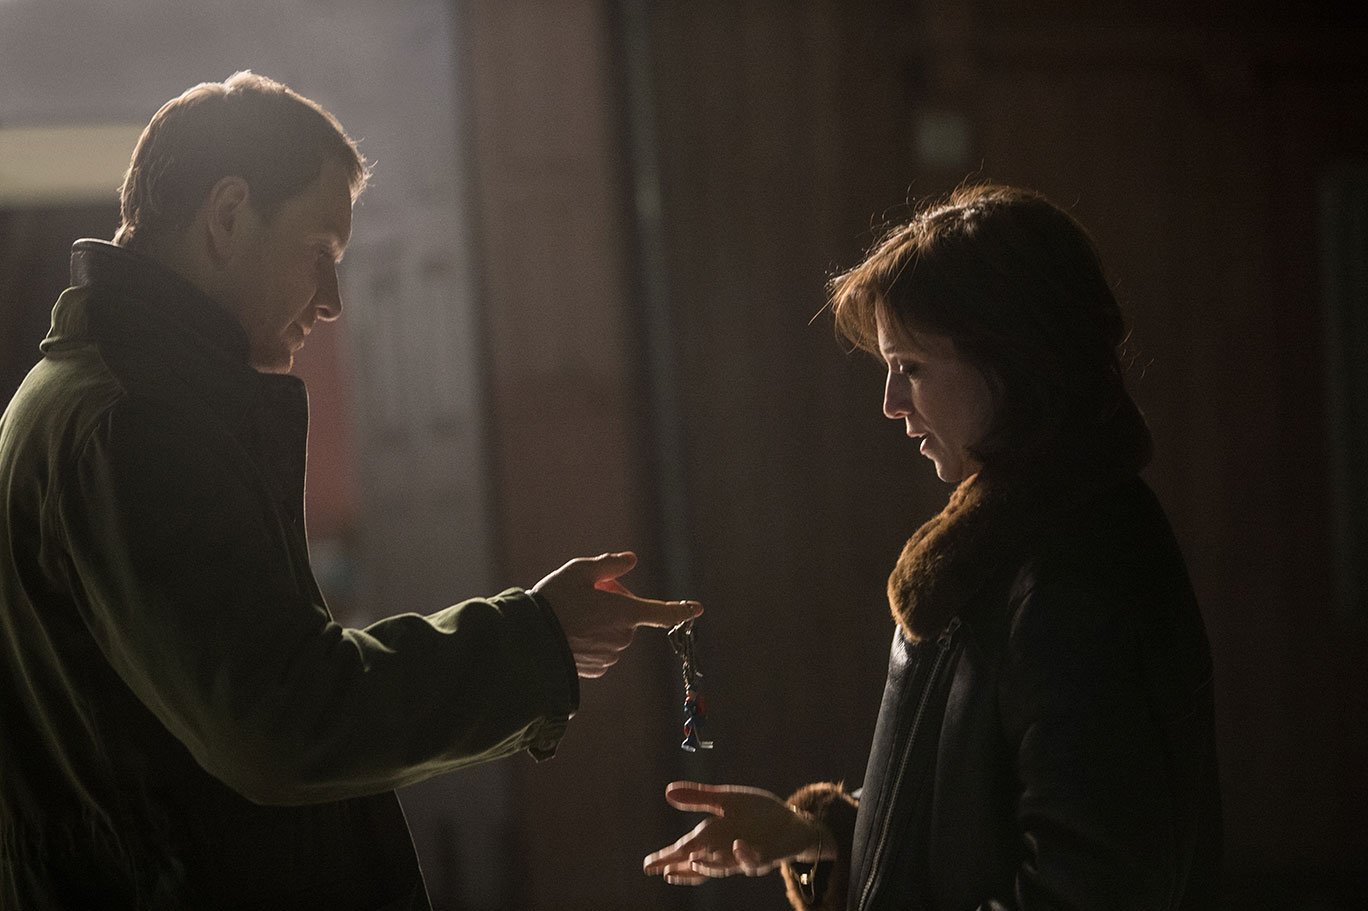 Harry Hole (Michael Fassbender) and Rakel (Charlotte Gainsbourg); source: www.spidersweb.pl